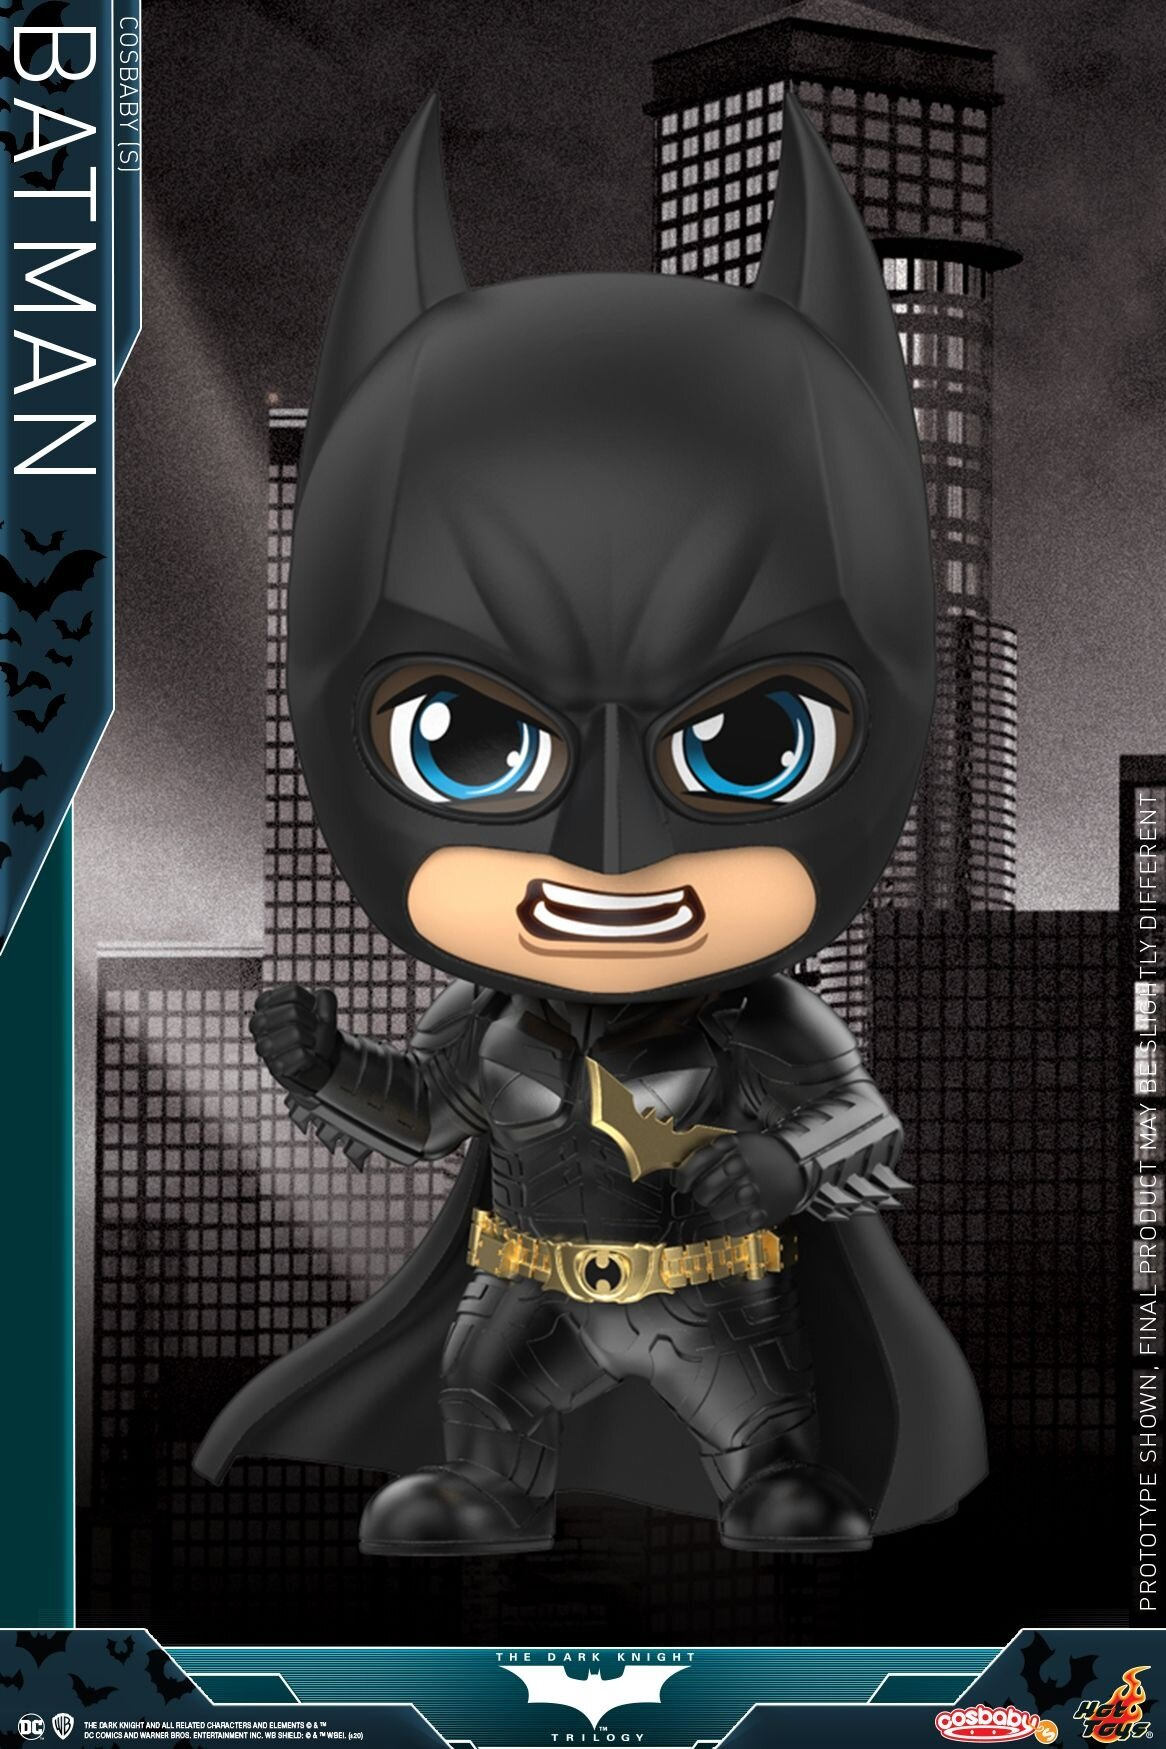 [Hot Toys] 코스베이비 다크 나이트 : 배트맨 COSB721